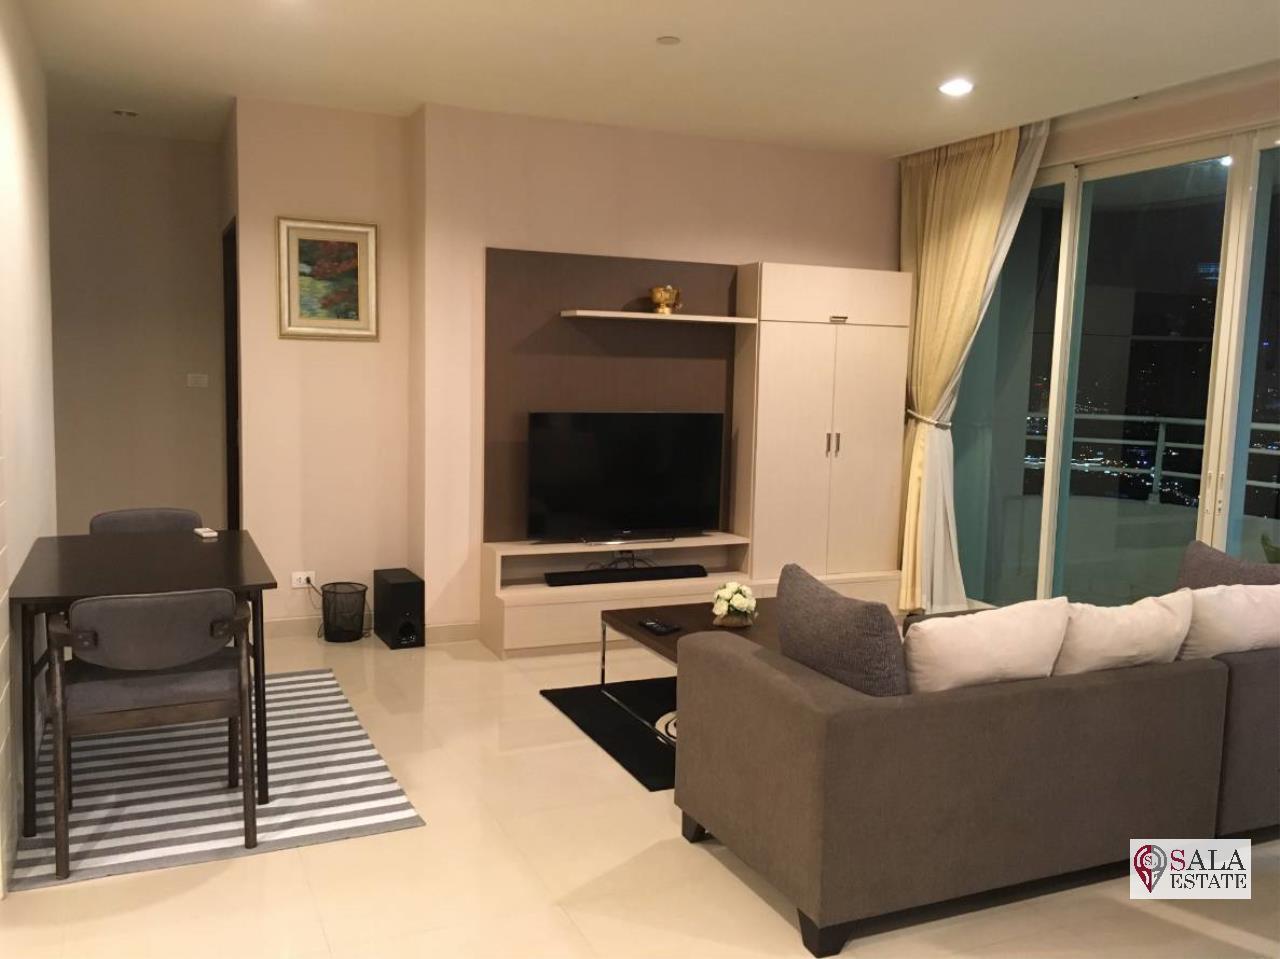 SALA ESTATE Agency's 3 bedroom  condo for sale in Watermark Chaophraya River near BTS Saphan Taksin 2